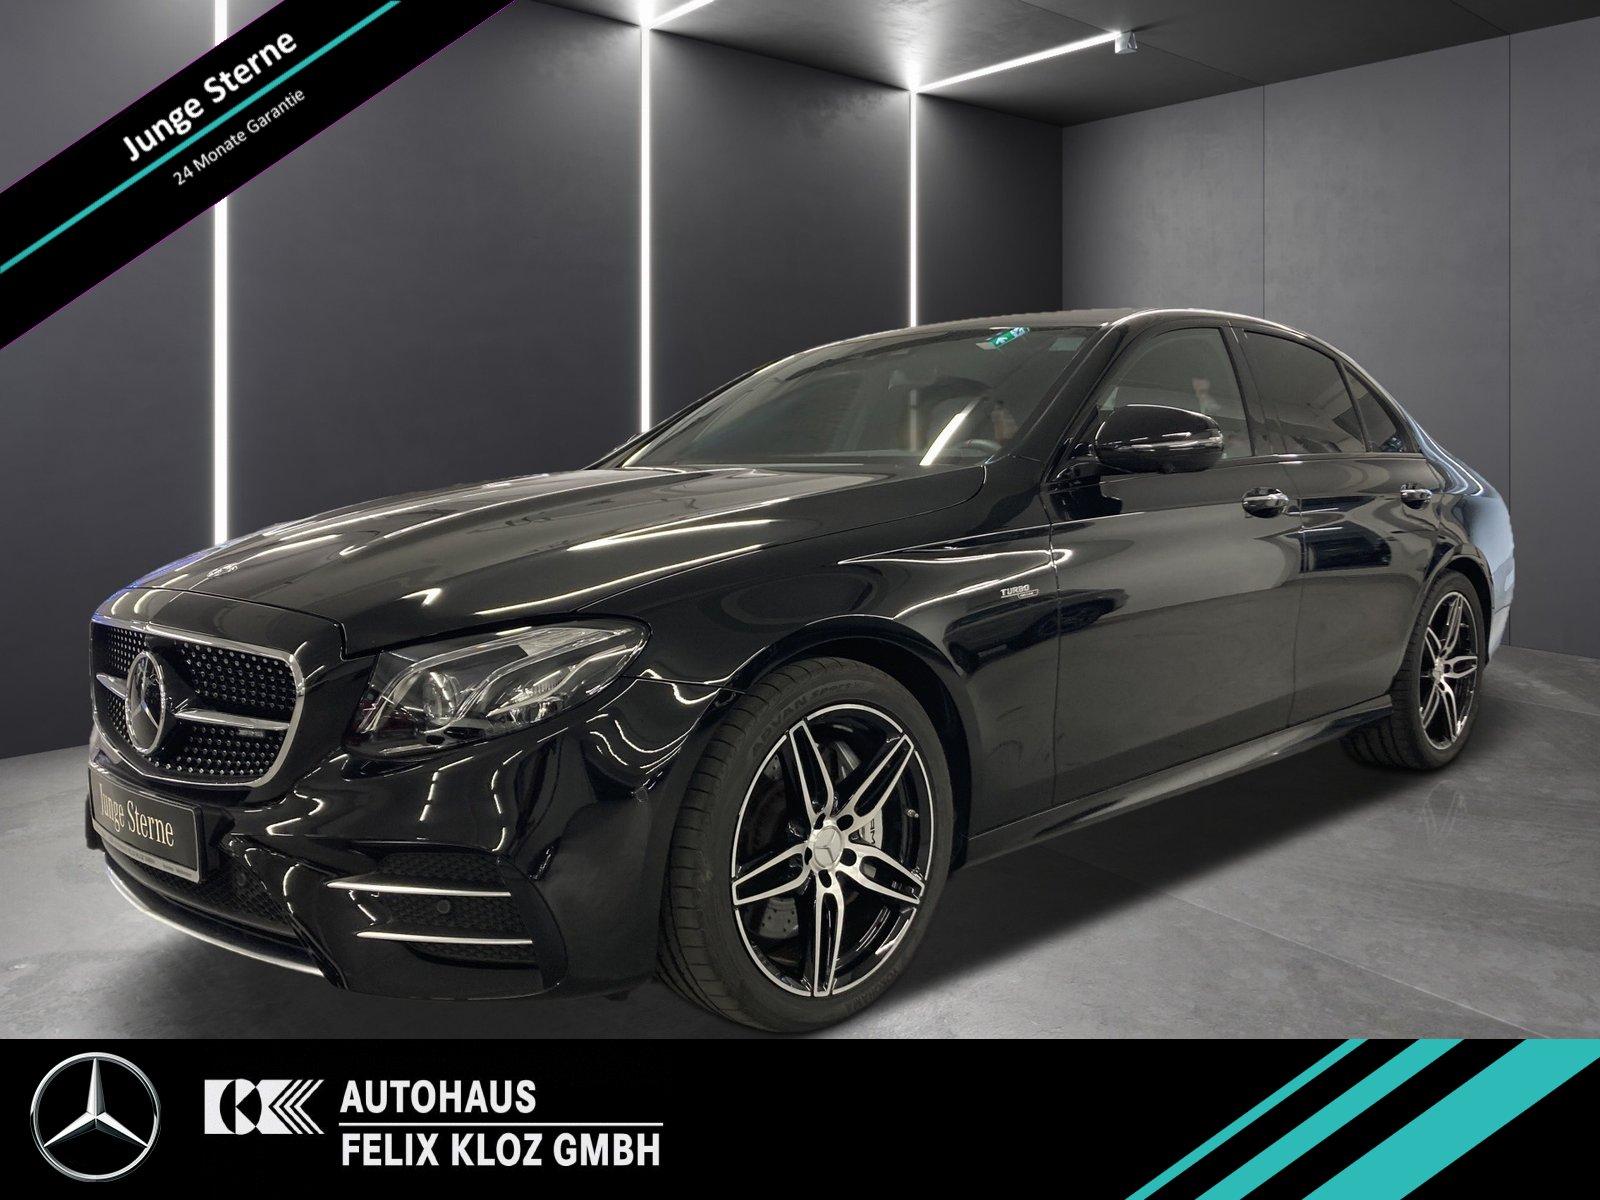 Mercedes-Benz E 53 AMG 4M+ FAP SHD AHK Keyless DAB COMAND 360°, Jahr 2020, Benzin